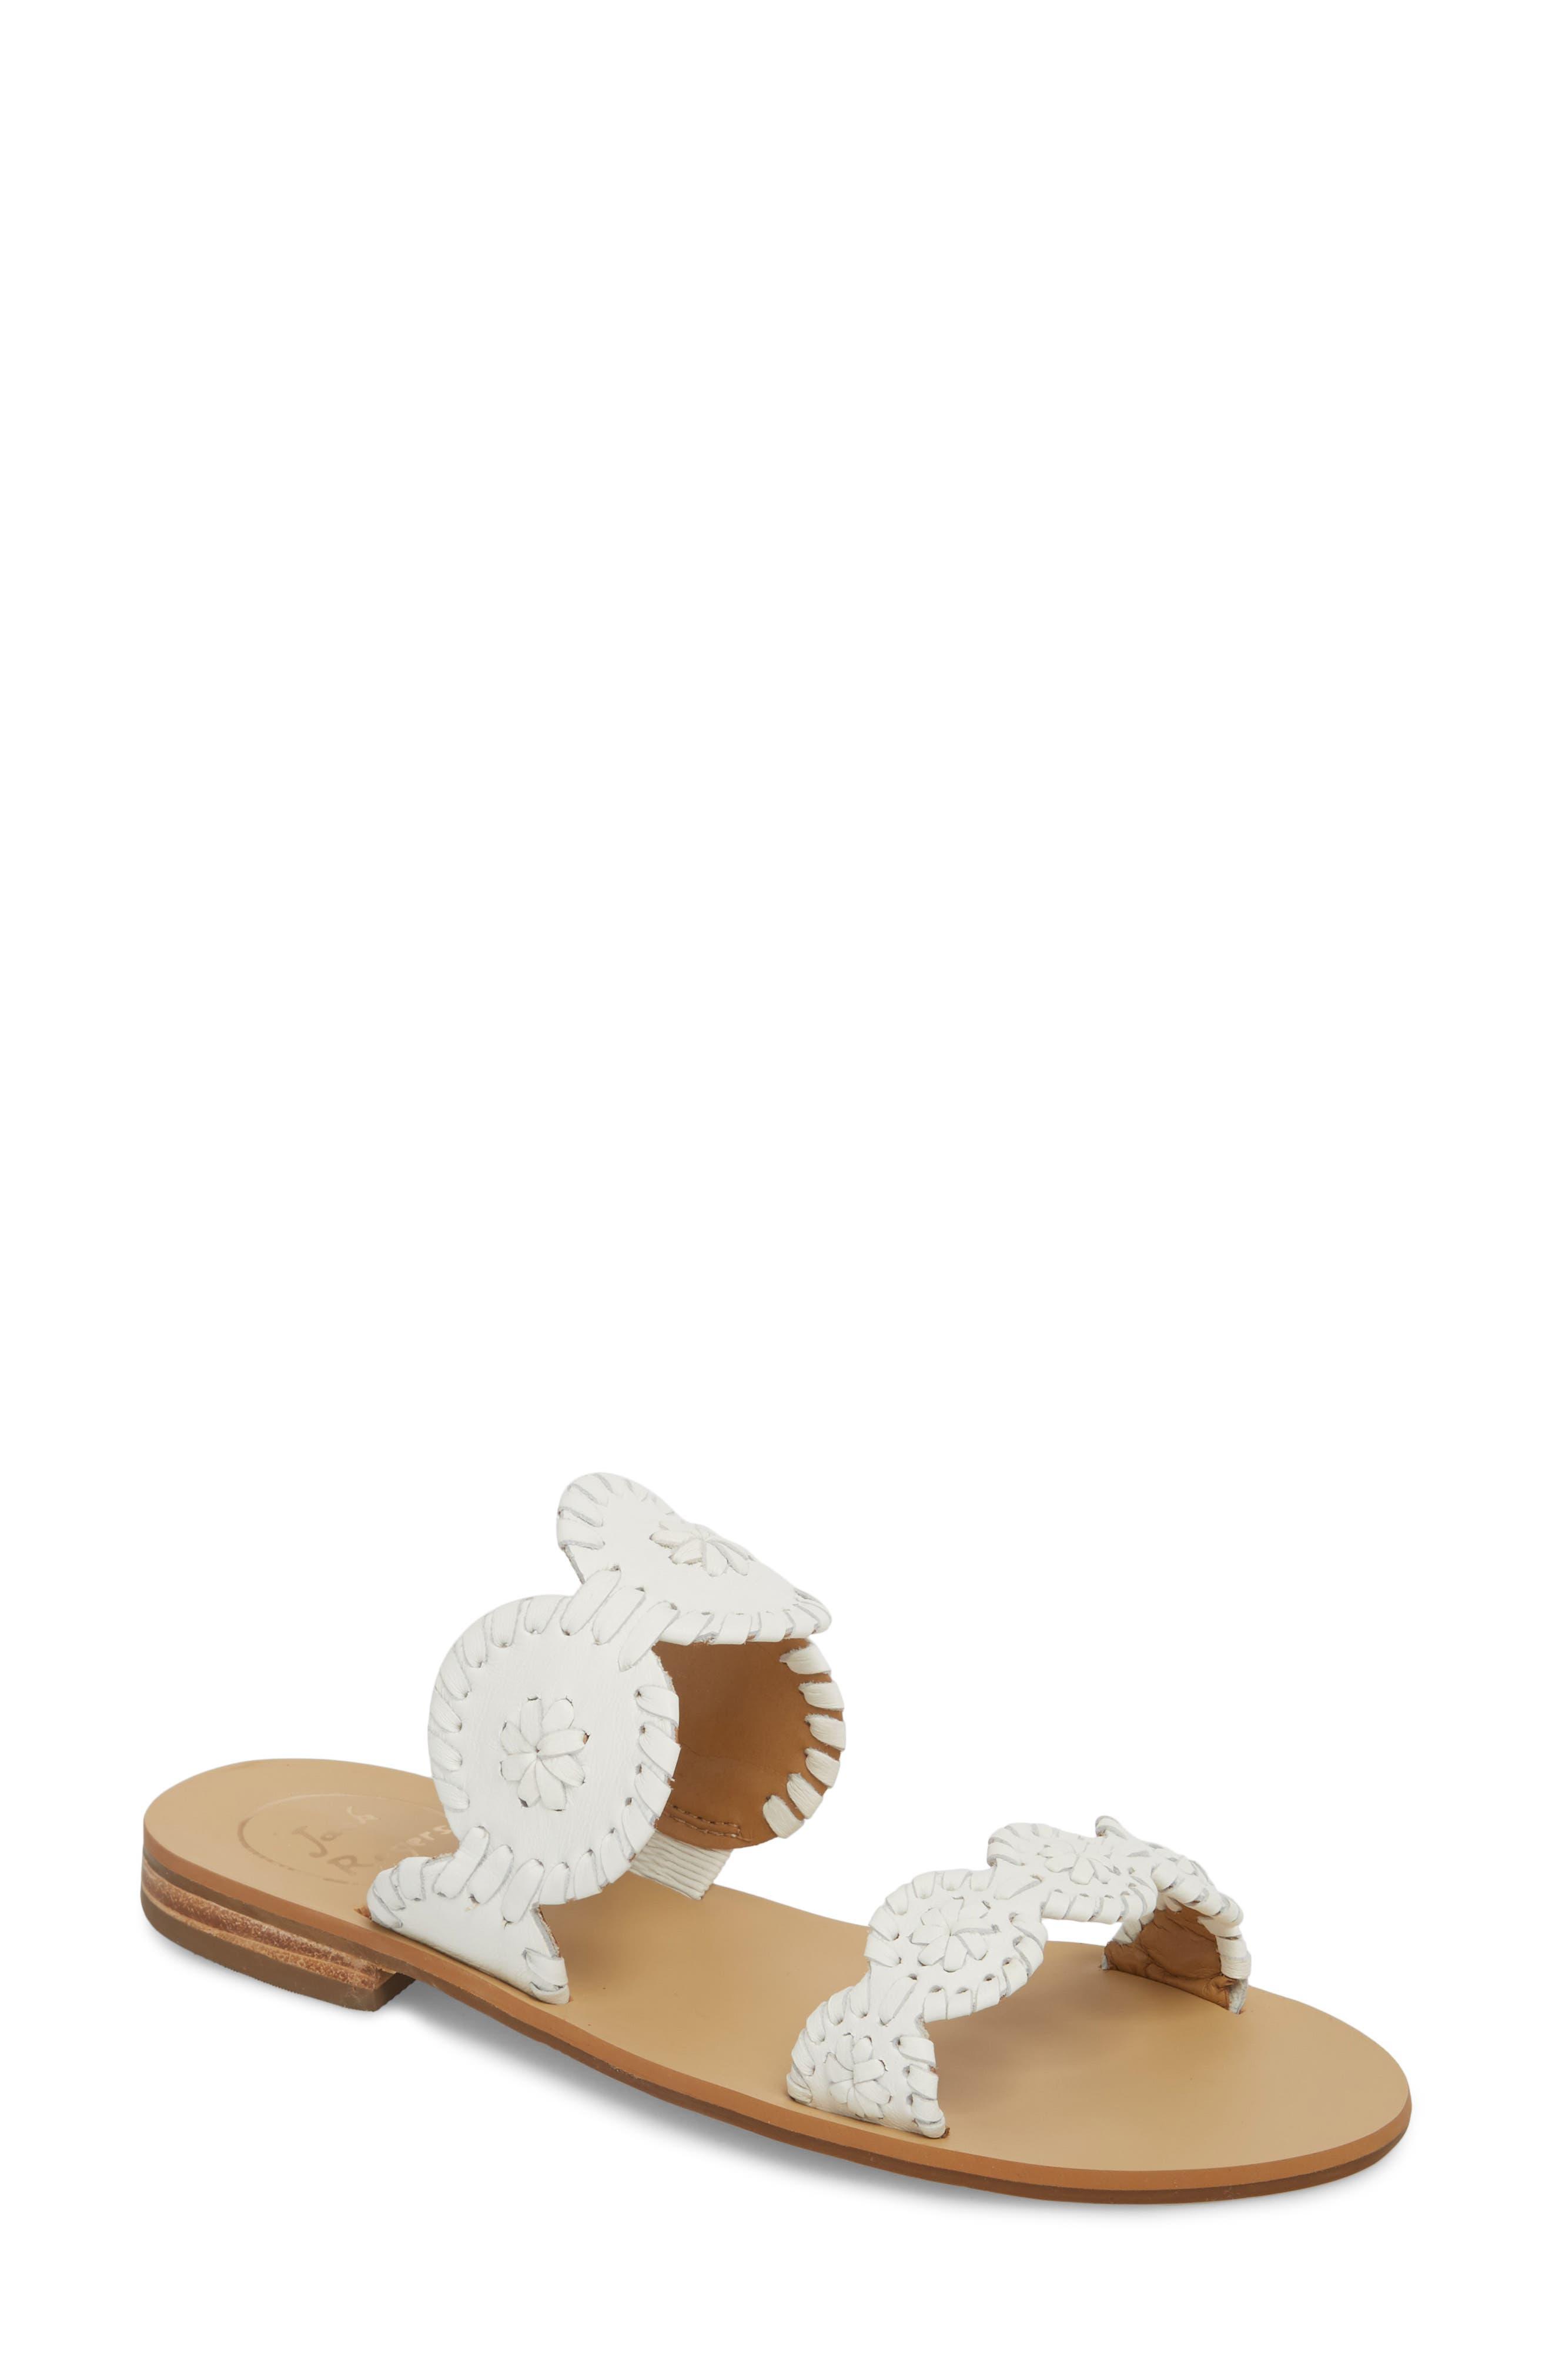 converse flip flops ebay